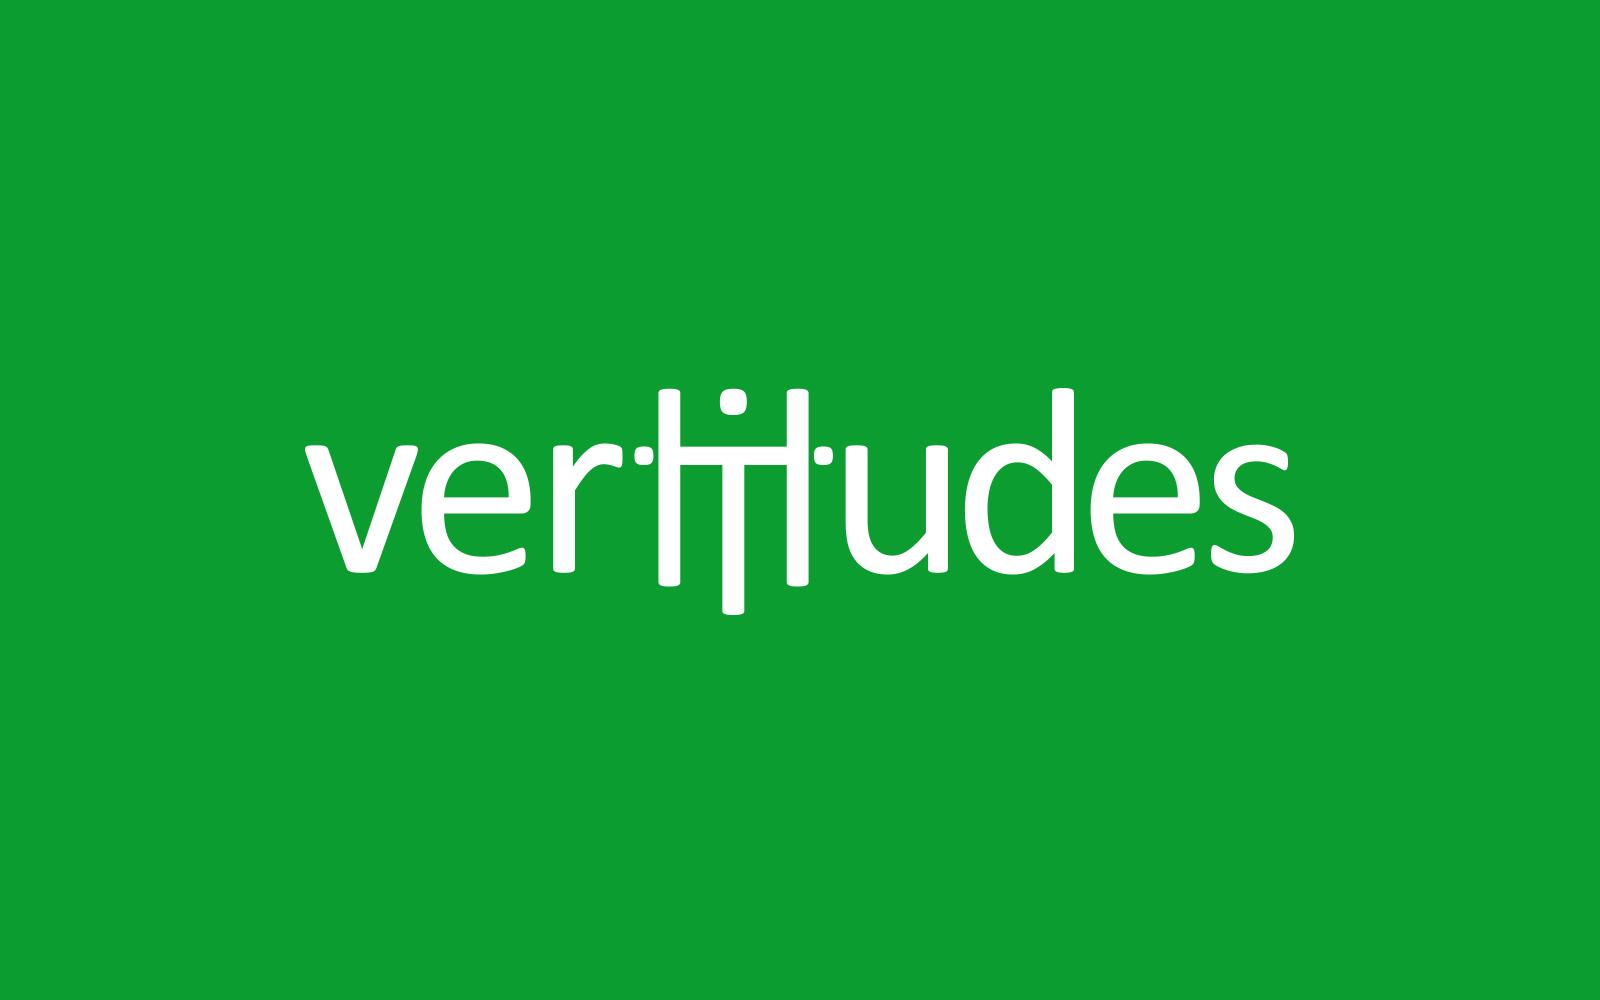 logo-vertitudes-typo-vert